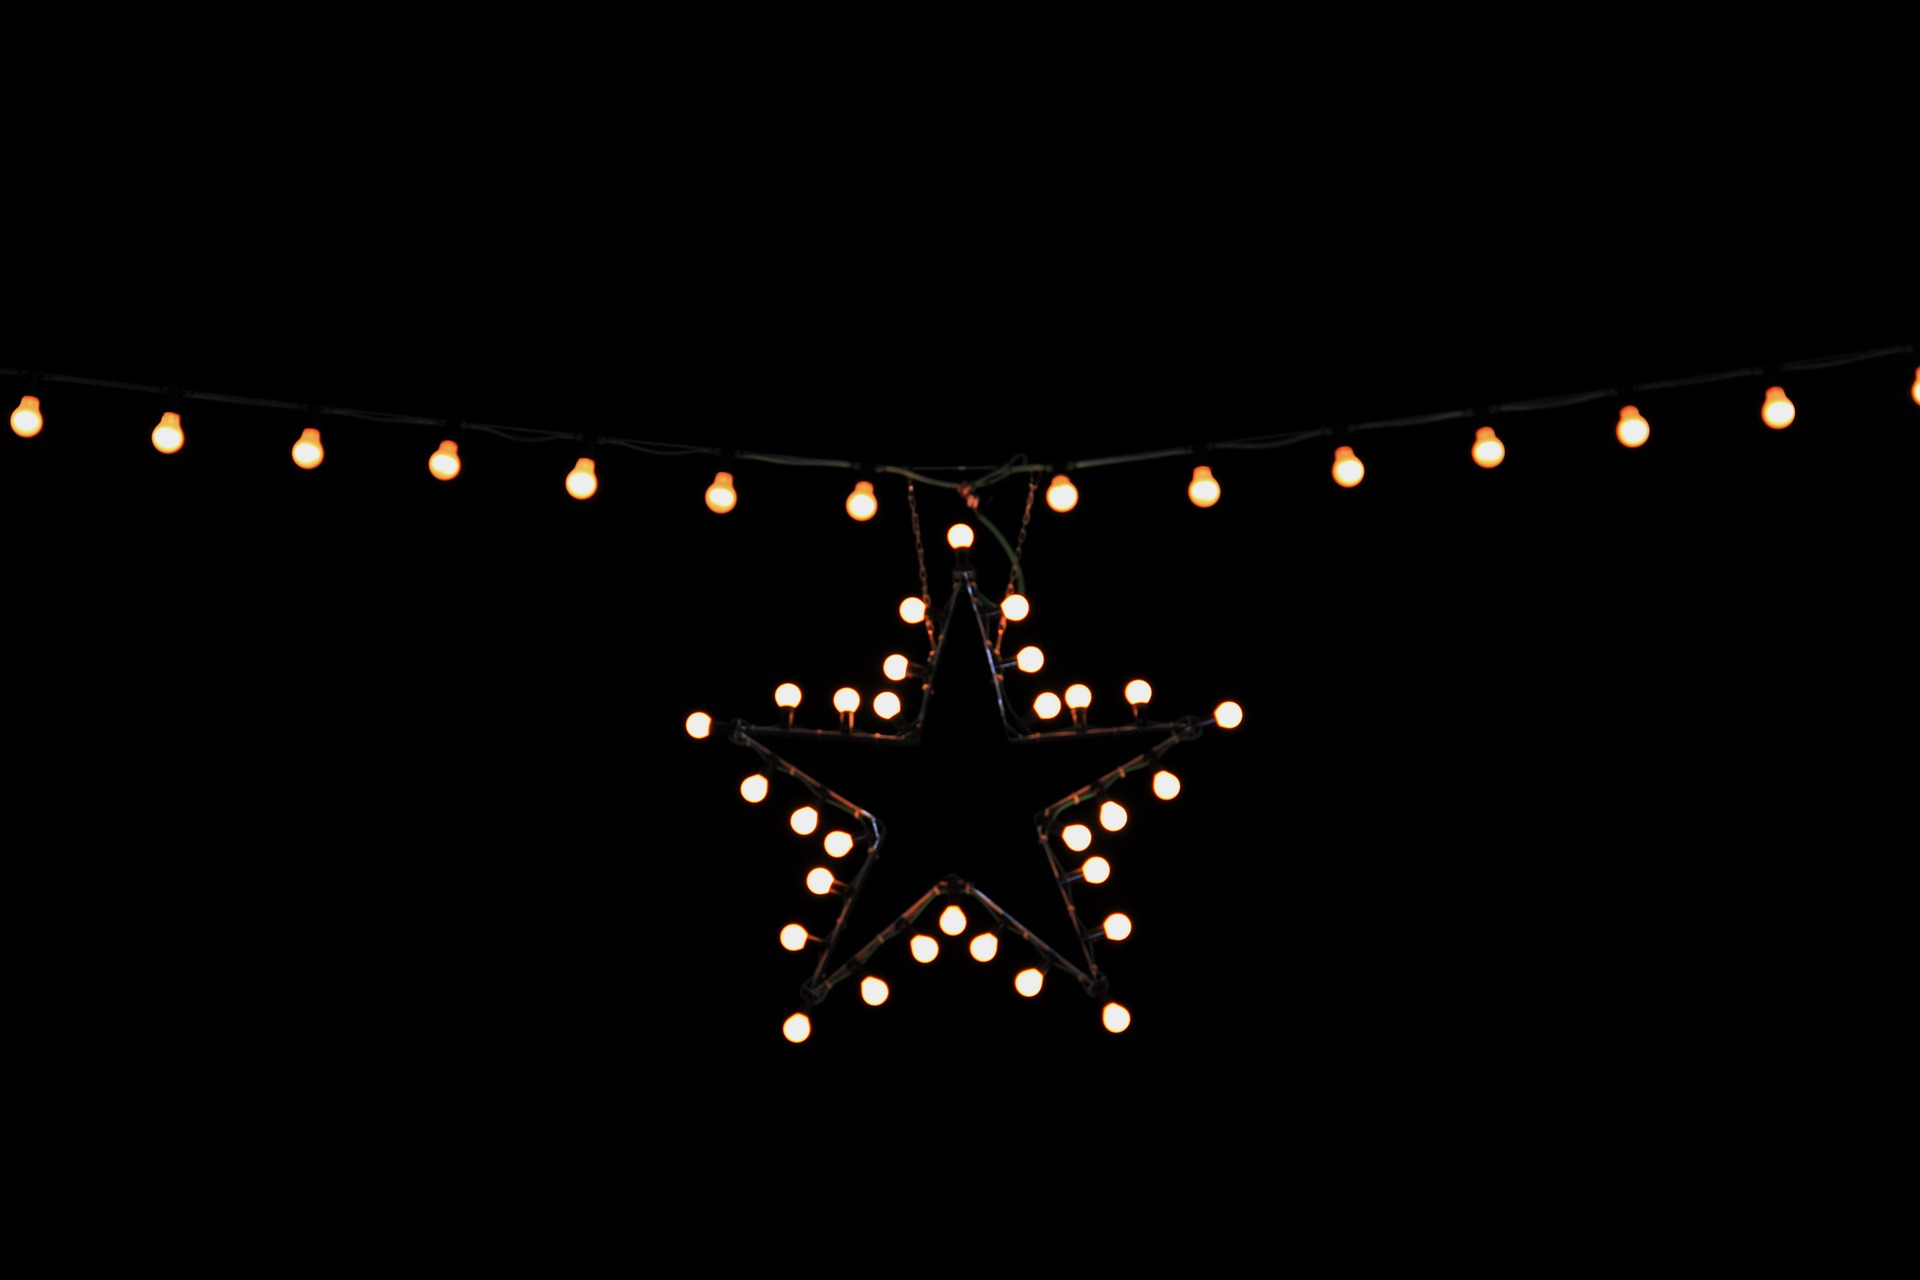 Lautern leuchtet ab dem 23. November